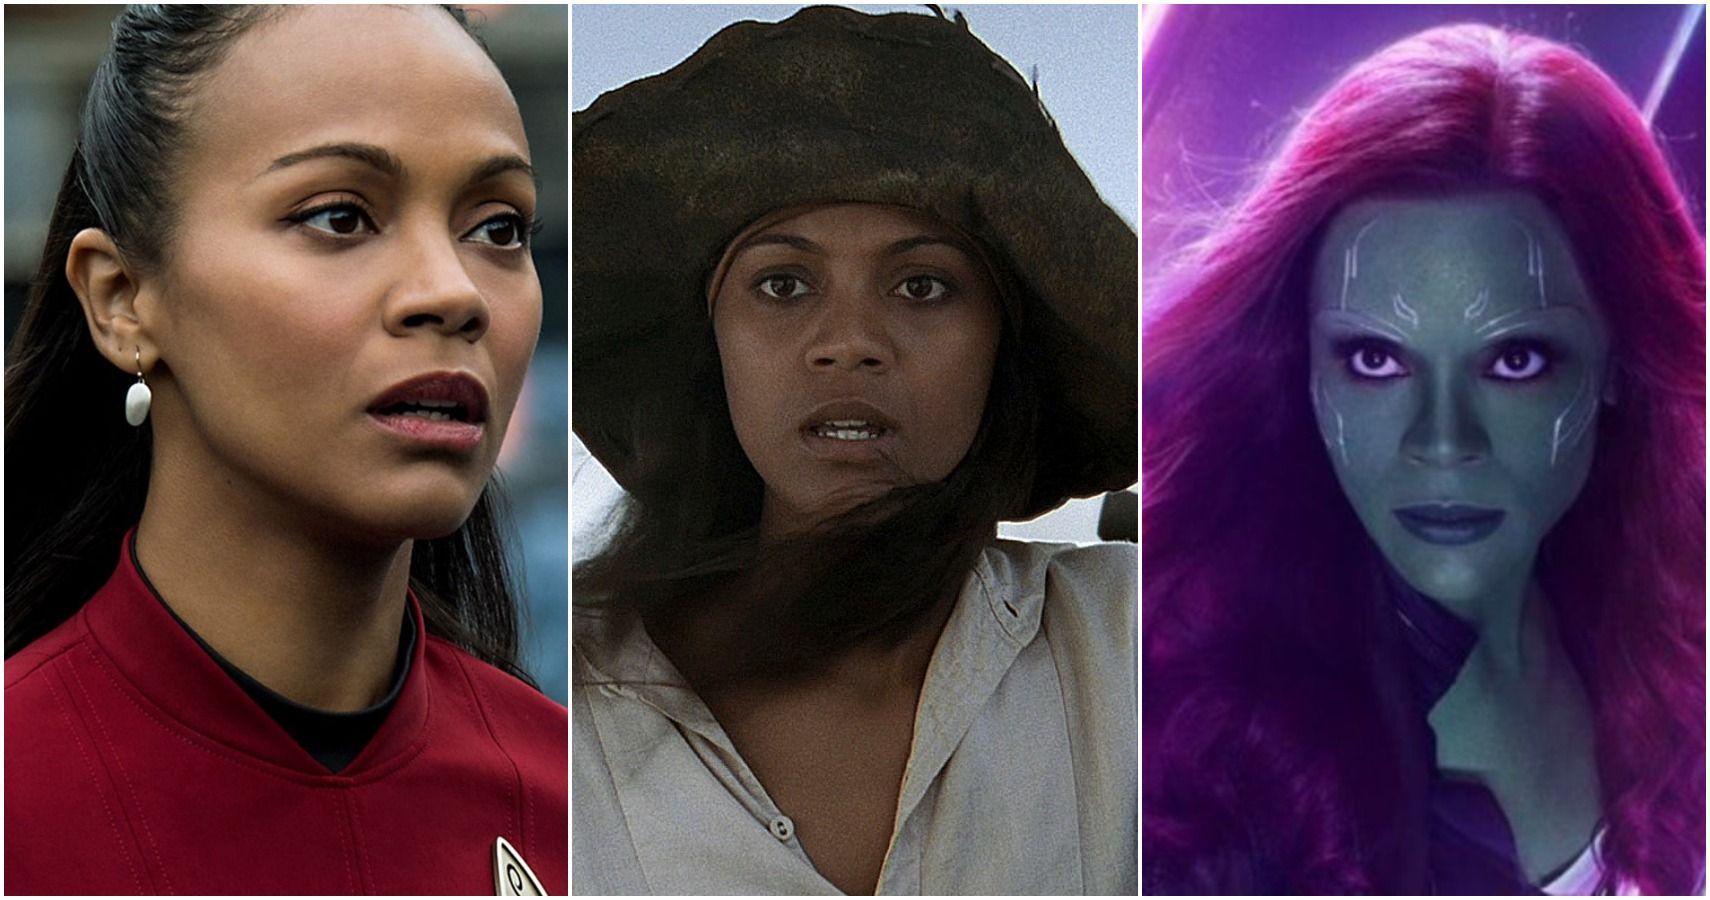 Zoe Saldana S 5 Best 5 Worst Movies According To Imdb